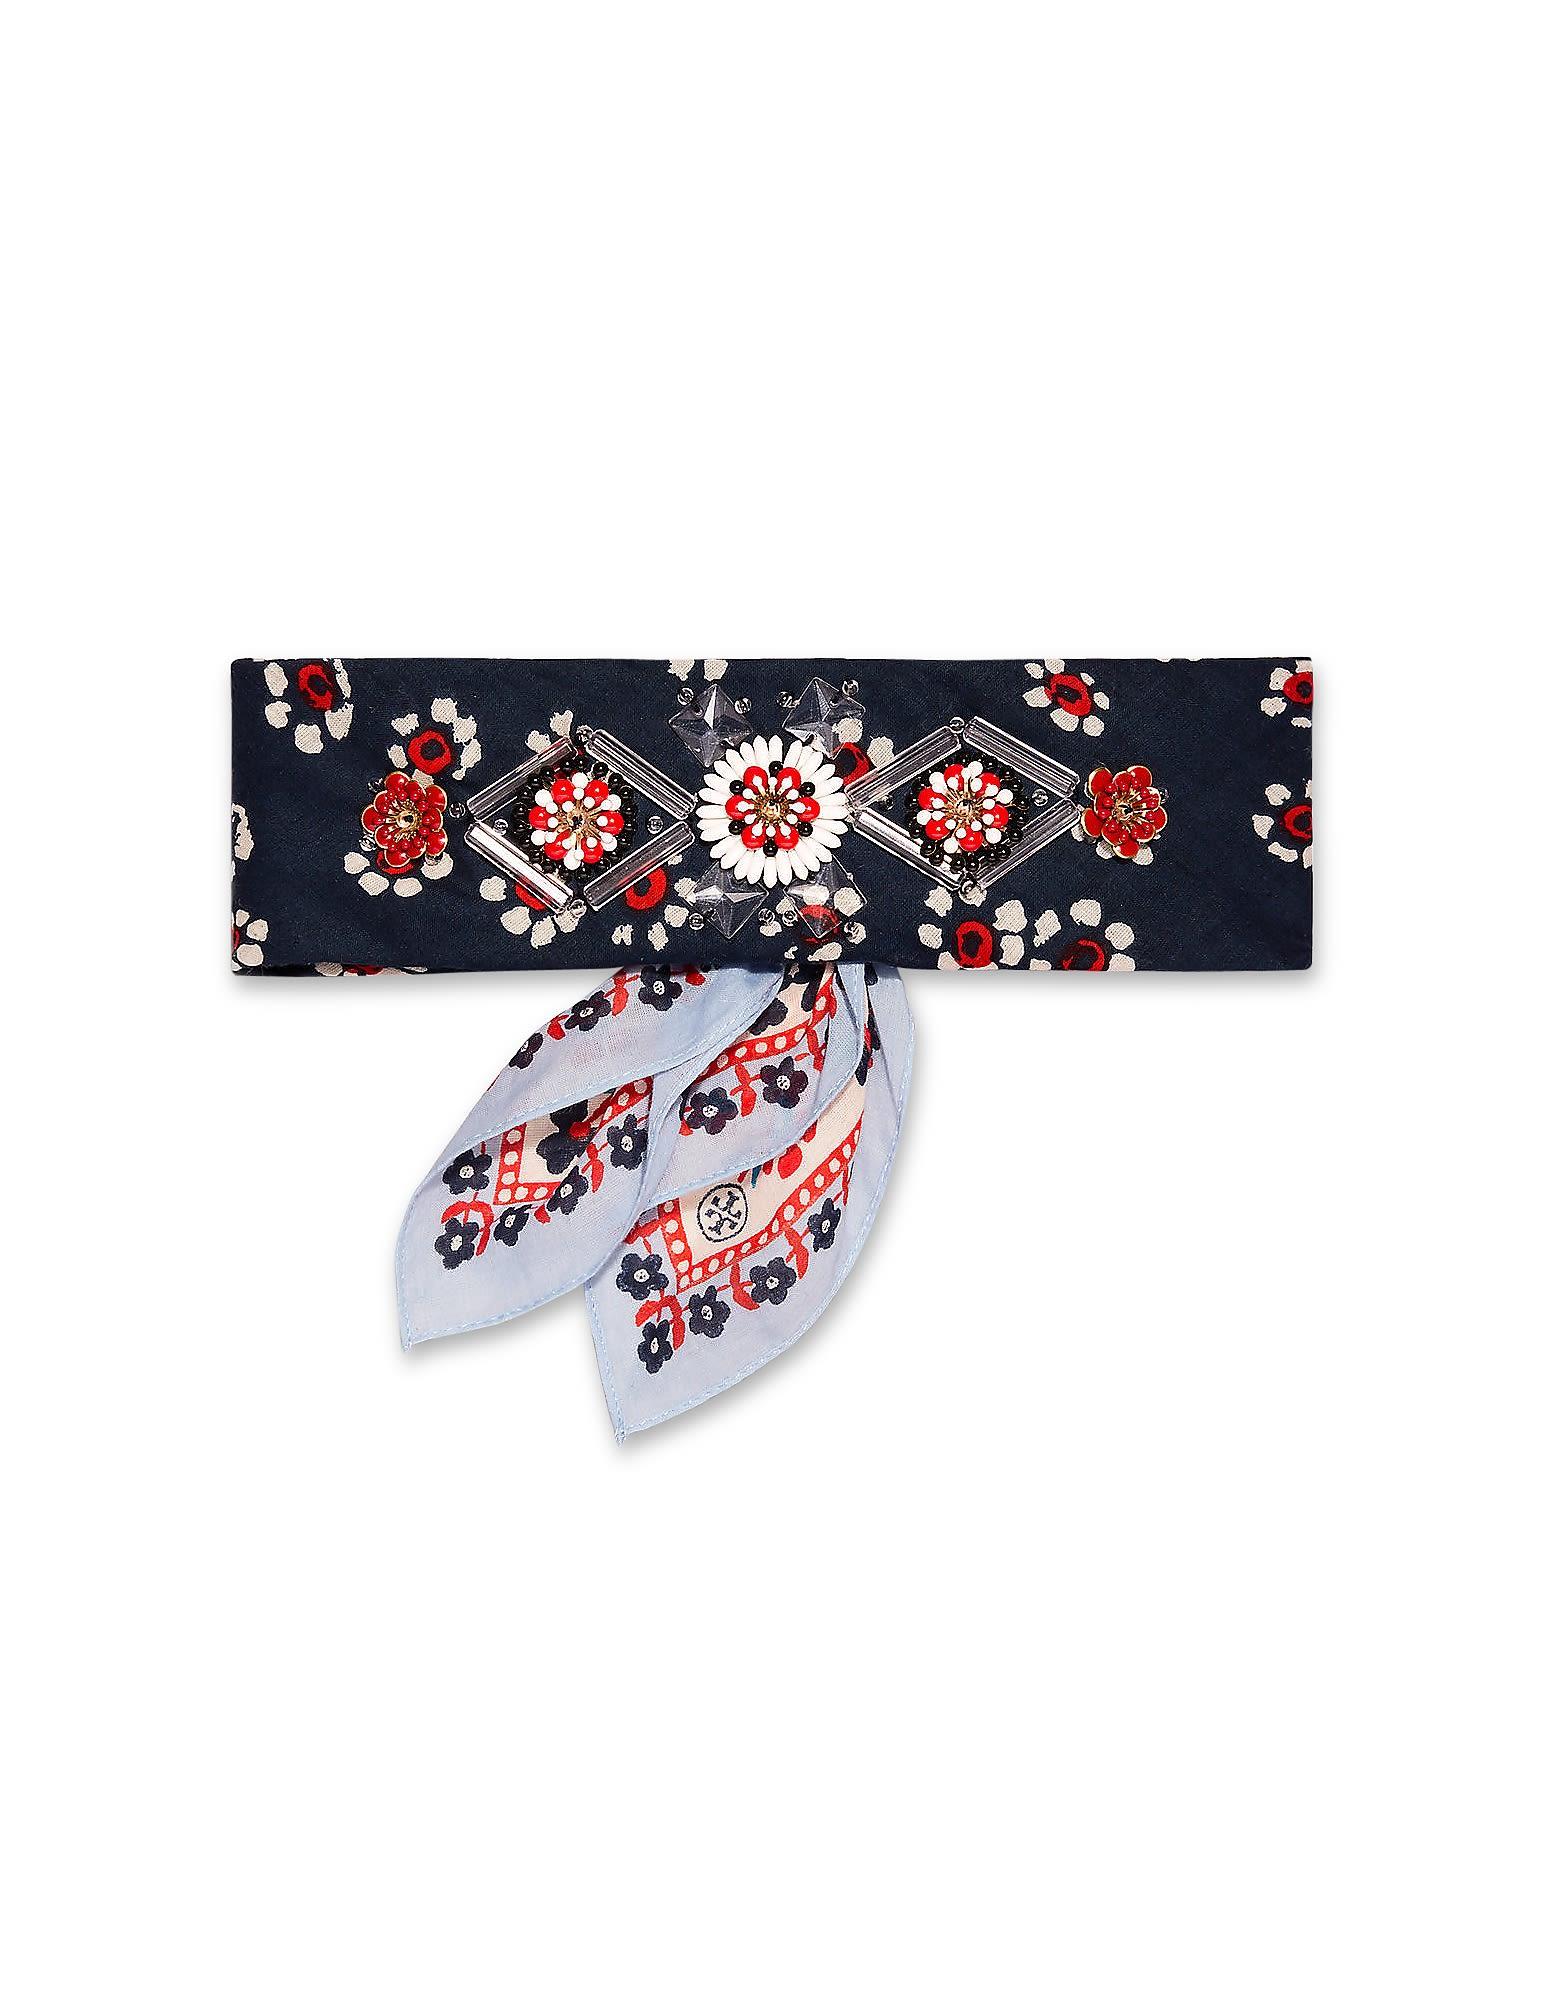 Tory Burch Floral Print Embellished Cotton Bandana Necktie